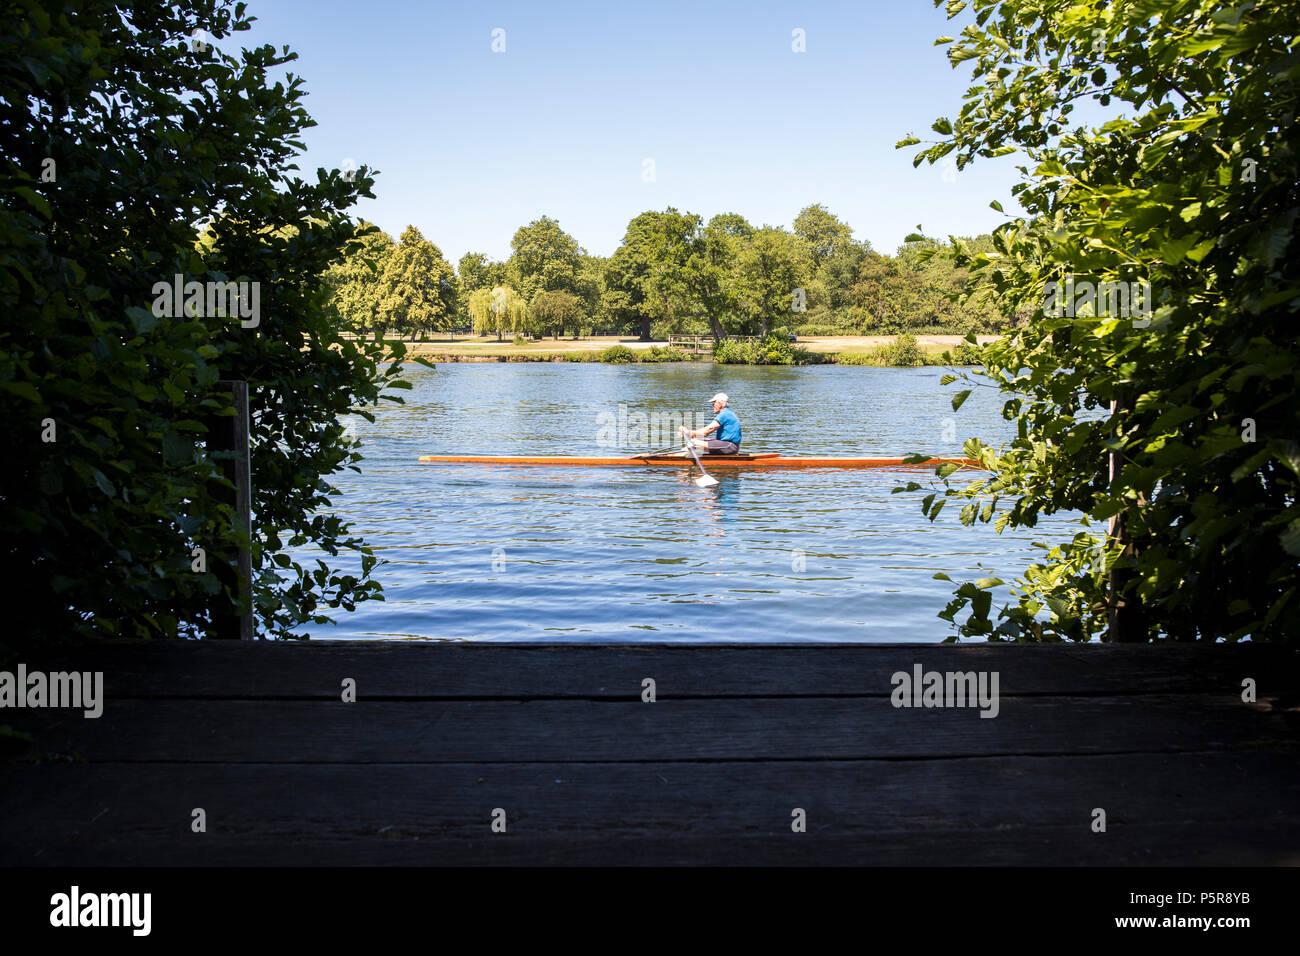 Vogatore Sculling sul Fiume Tamigi a Henley on Thames in Oxfordshire UK Immagini Stock